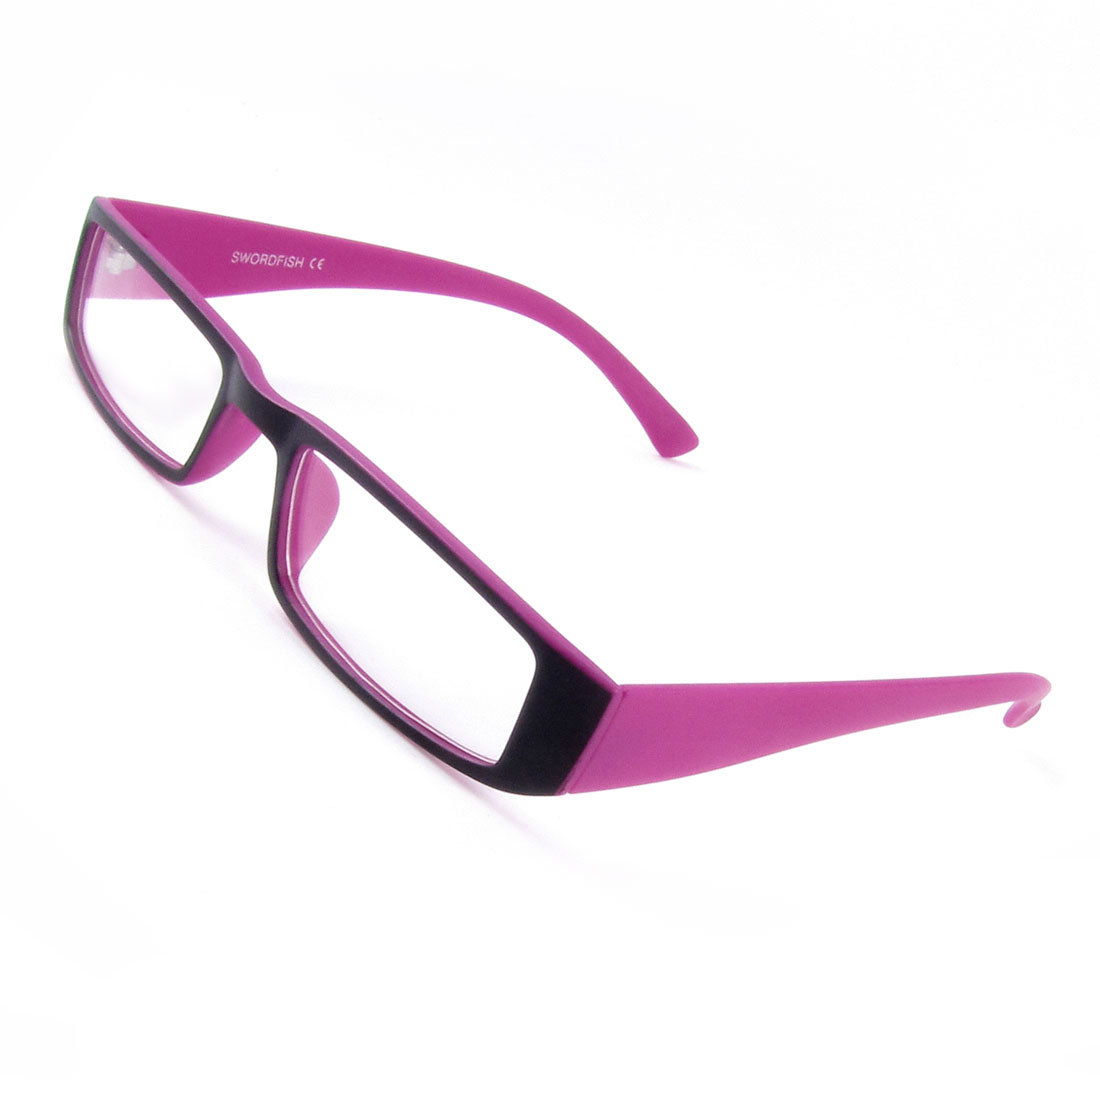 Ladies Women Rectangle Shaped Clear Lens Single Bridge Plano Plain Glasses